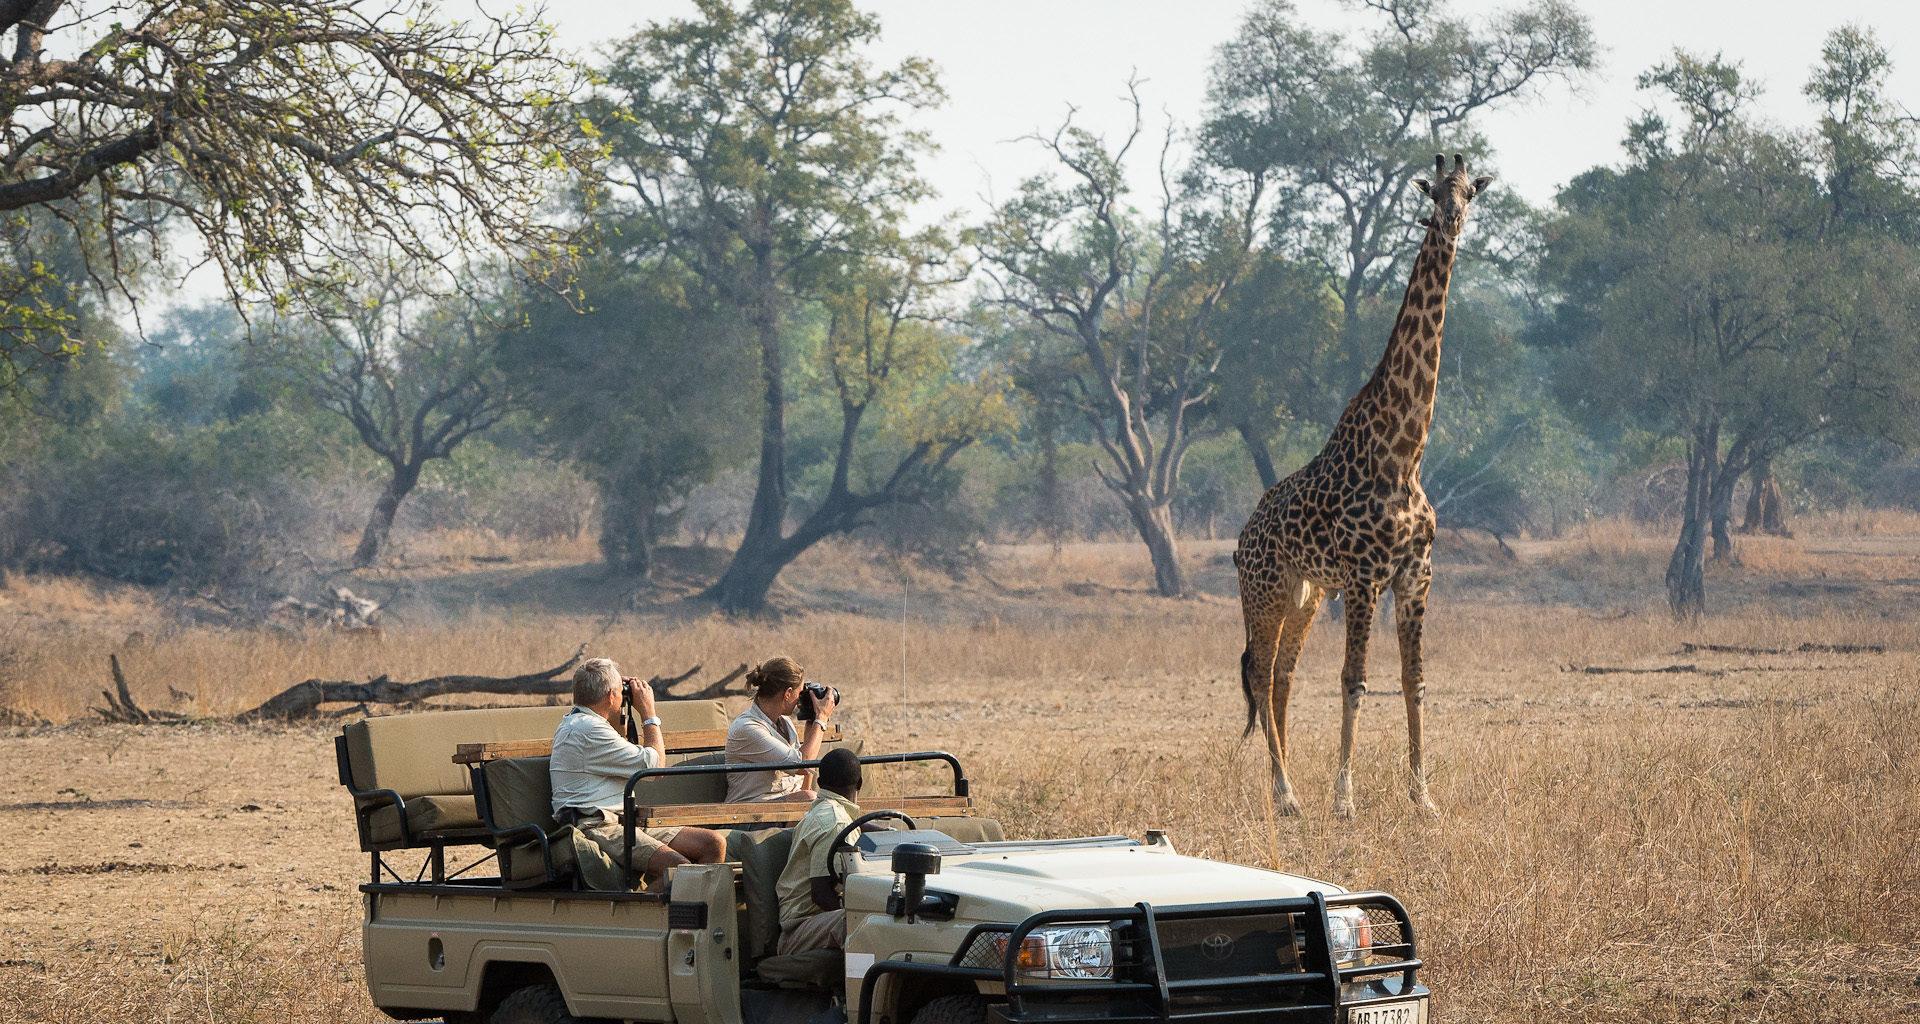 Robins-House-Zambia giraffe